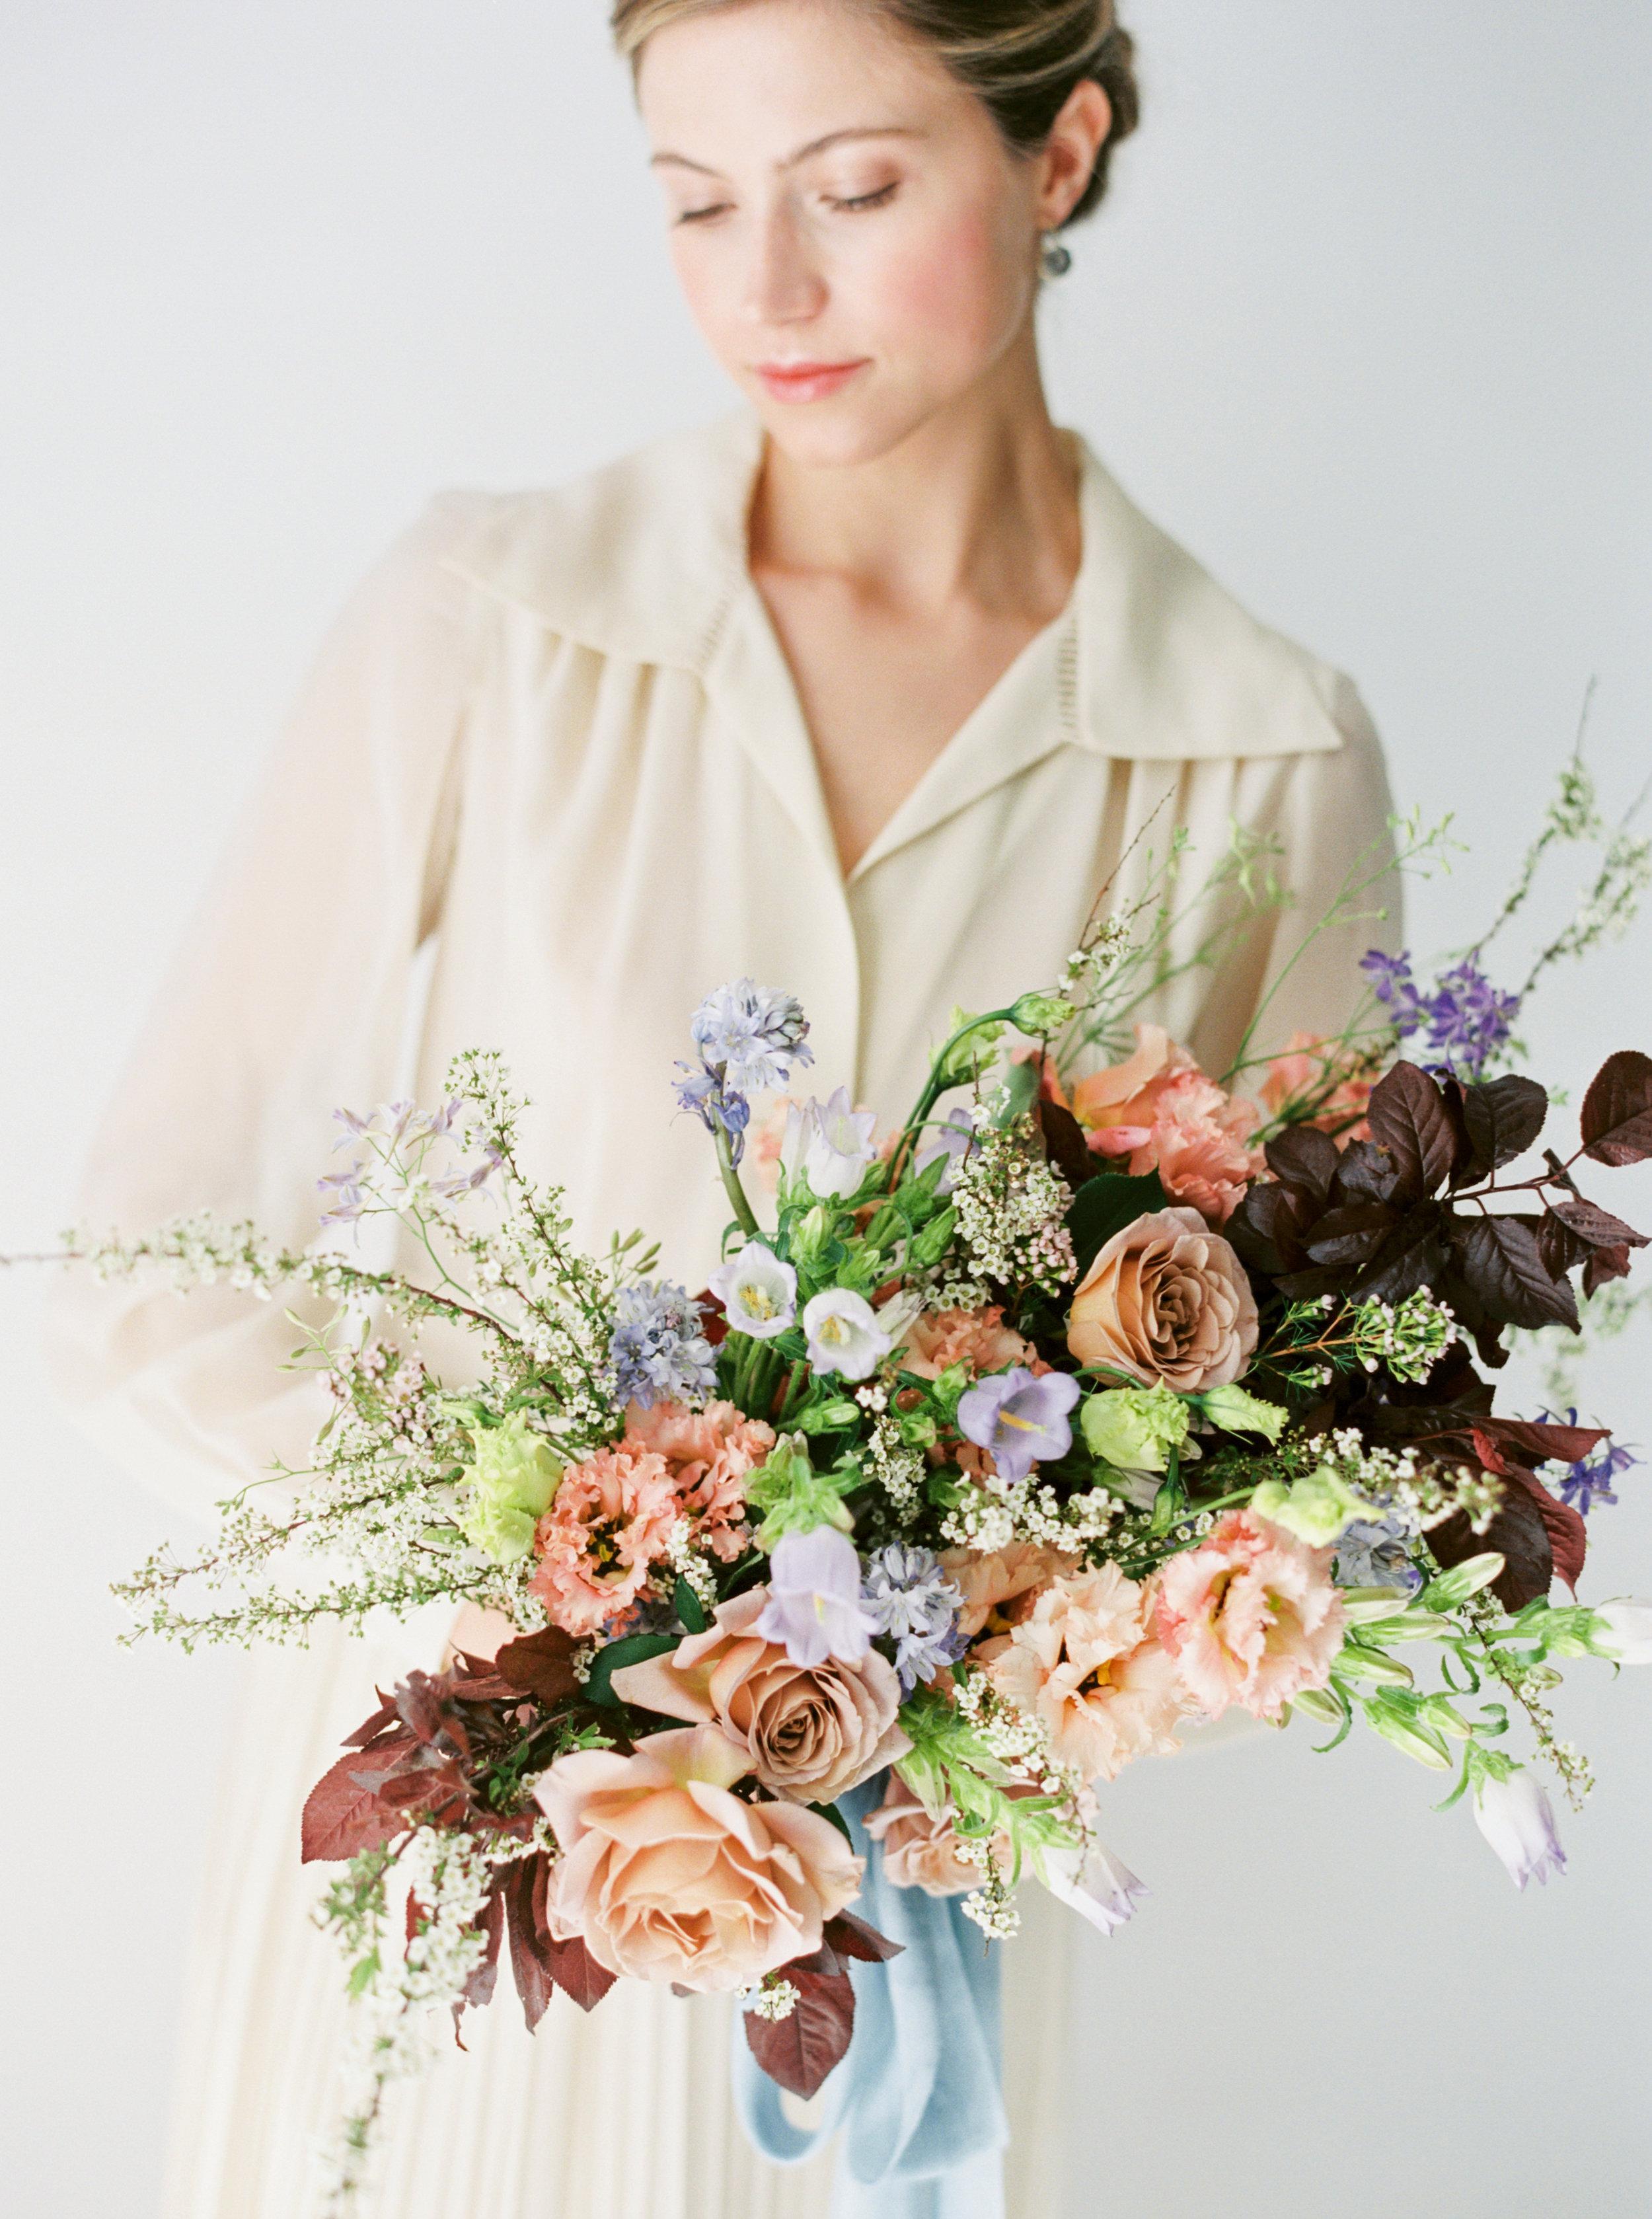 Amanda Nippoldt Photography  Ashley Fox Designs 1:1 workshop with Blue Morning Glory Florals  model: Taylor Penshorn